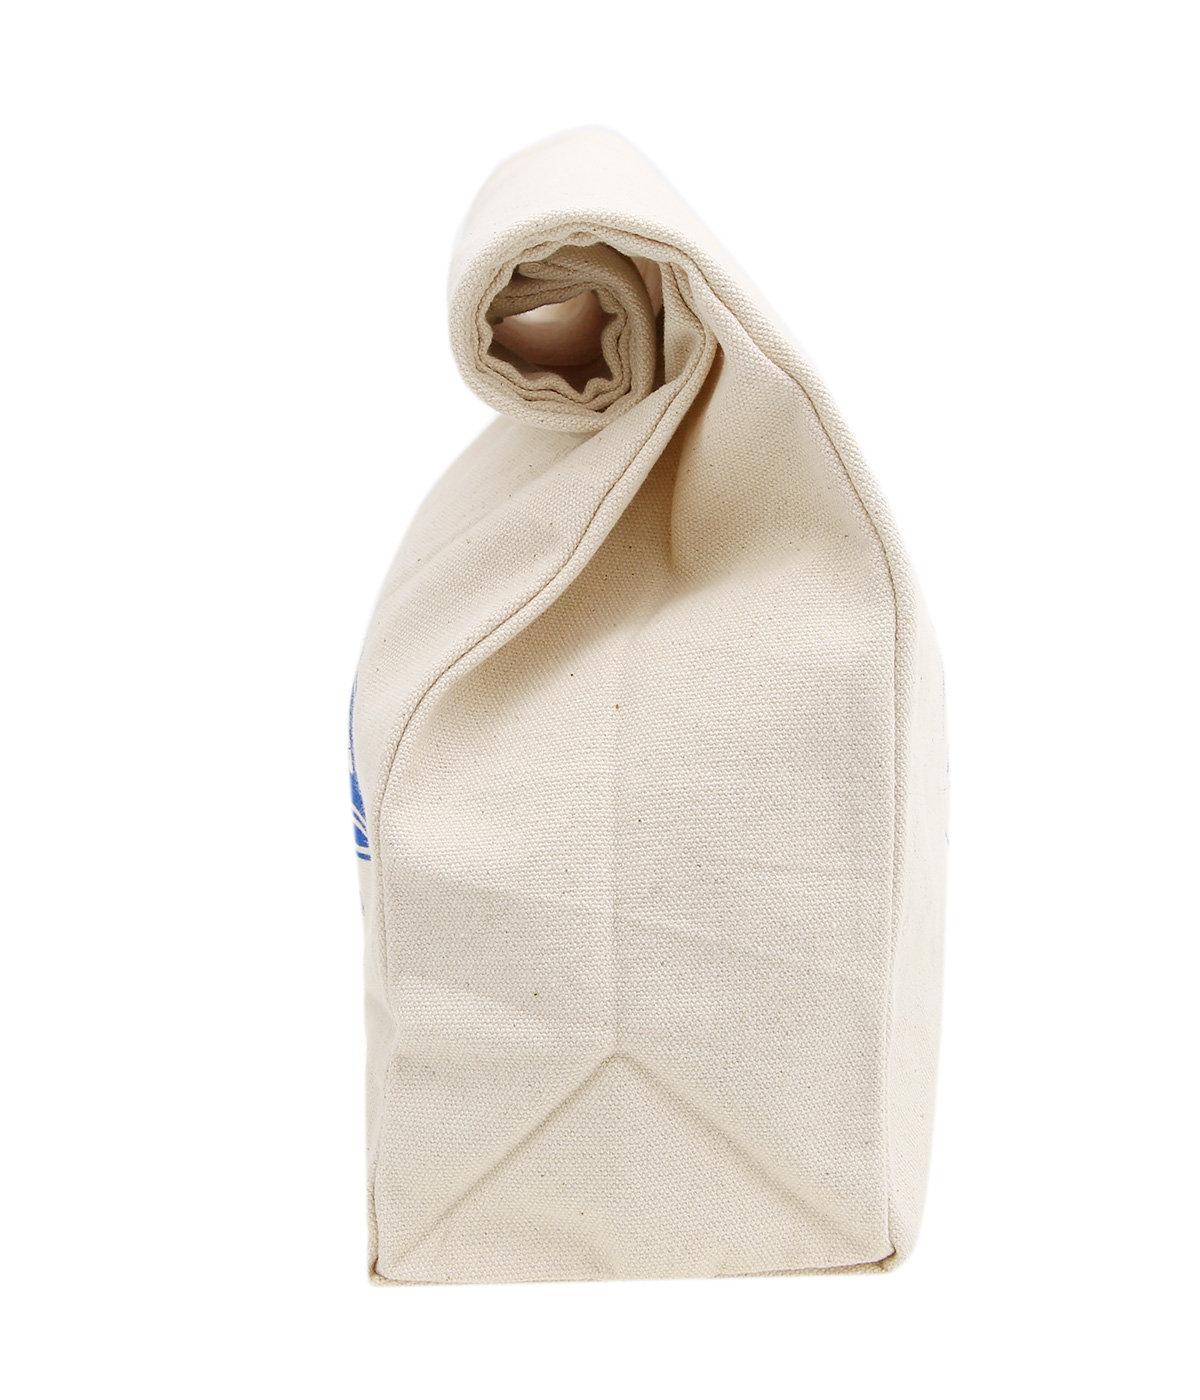 ARKNETS BAKERY BAG